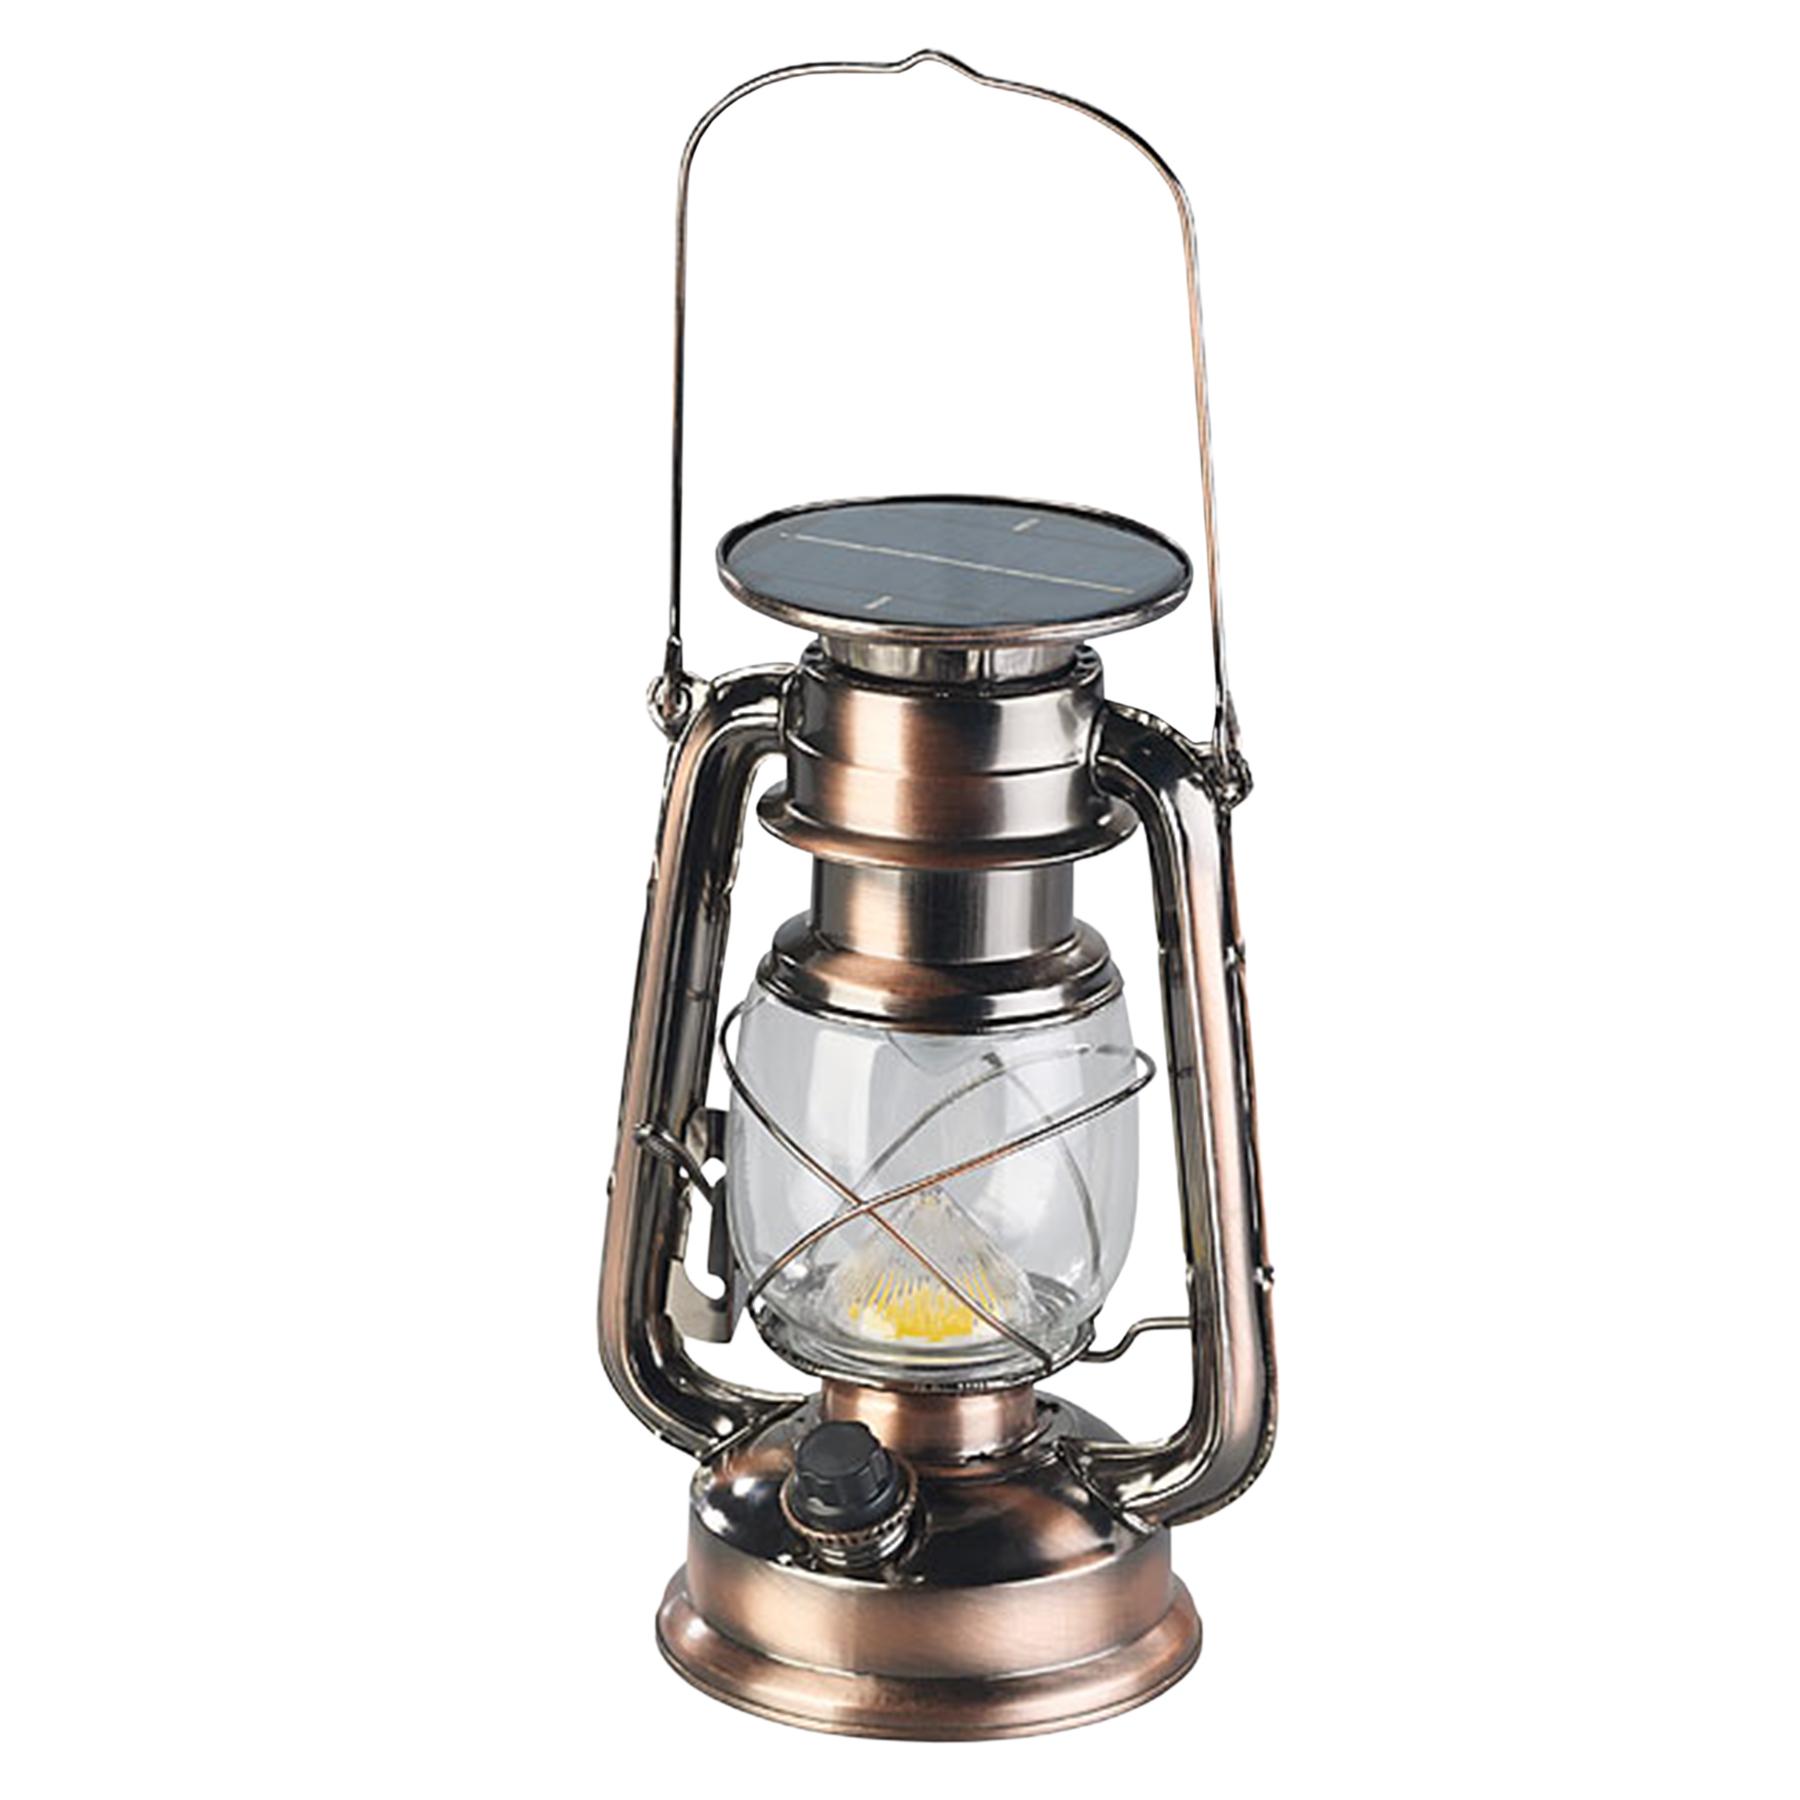 Solarbetriebene LED Leuchte im Sturmlampen-Design